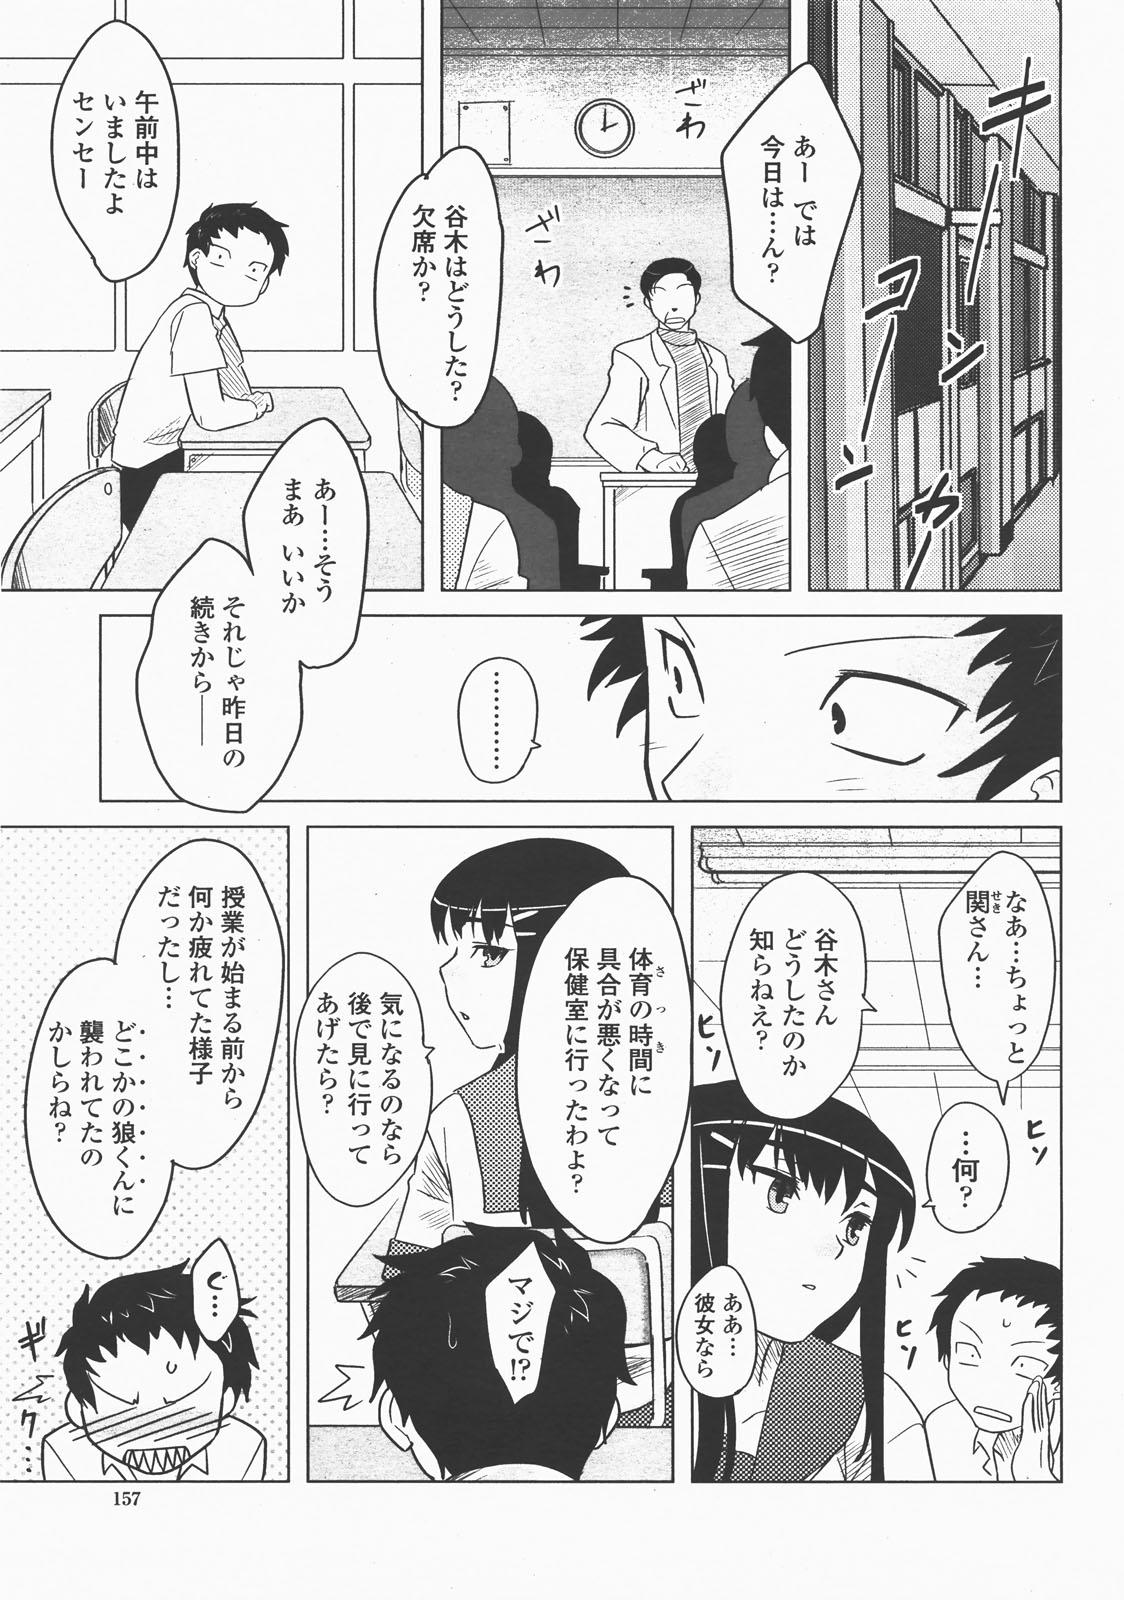 COMIC Momohime 2007-12 159